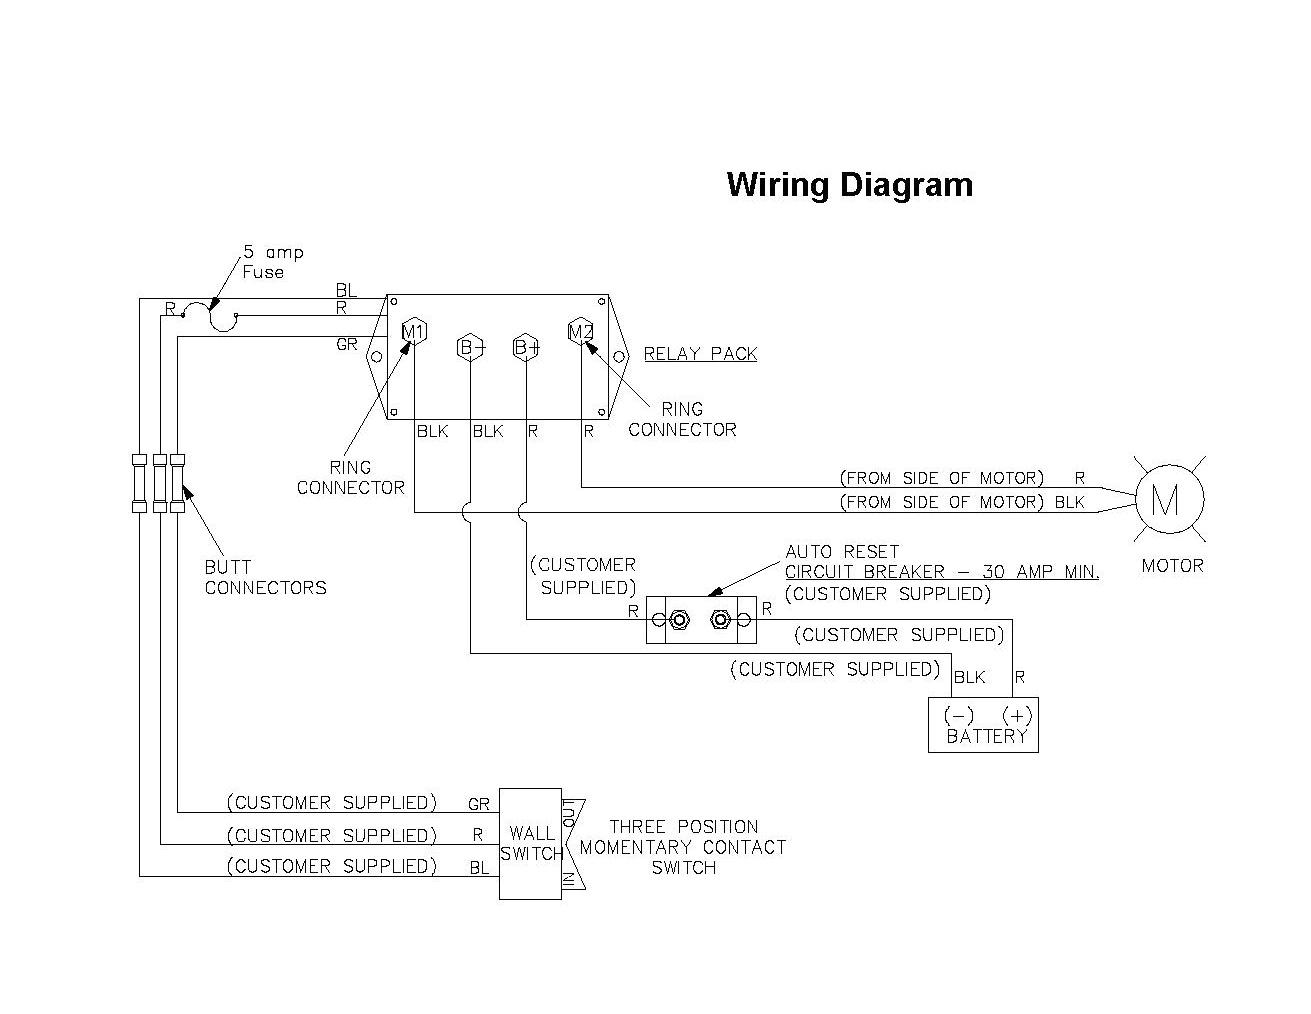 Rv Slide Out Switch Wiring Diagram Rv Slide Out Switch Wiring Diagram Lovely Rv Slide Out Switch Wiring